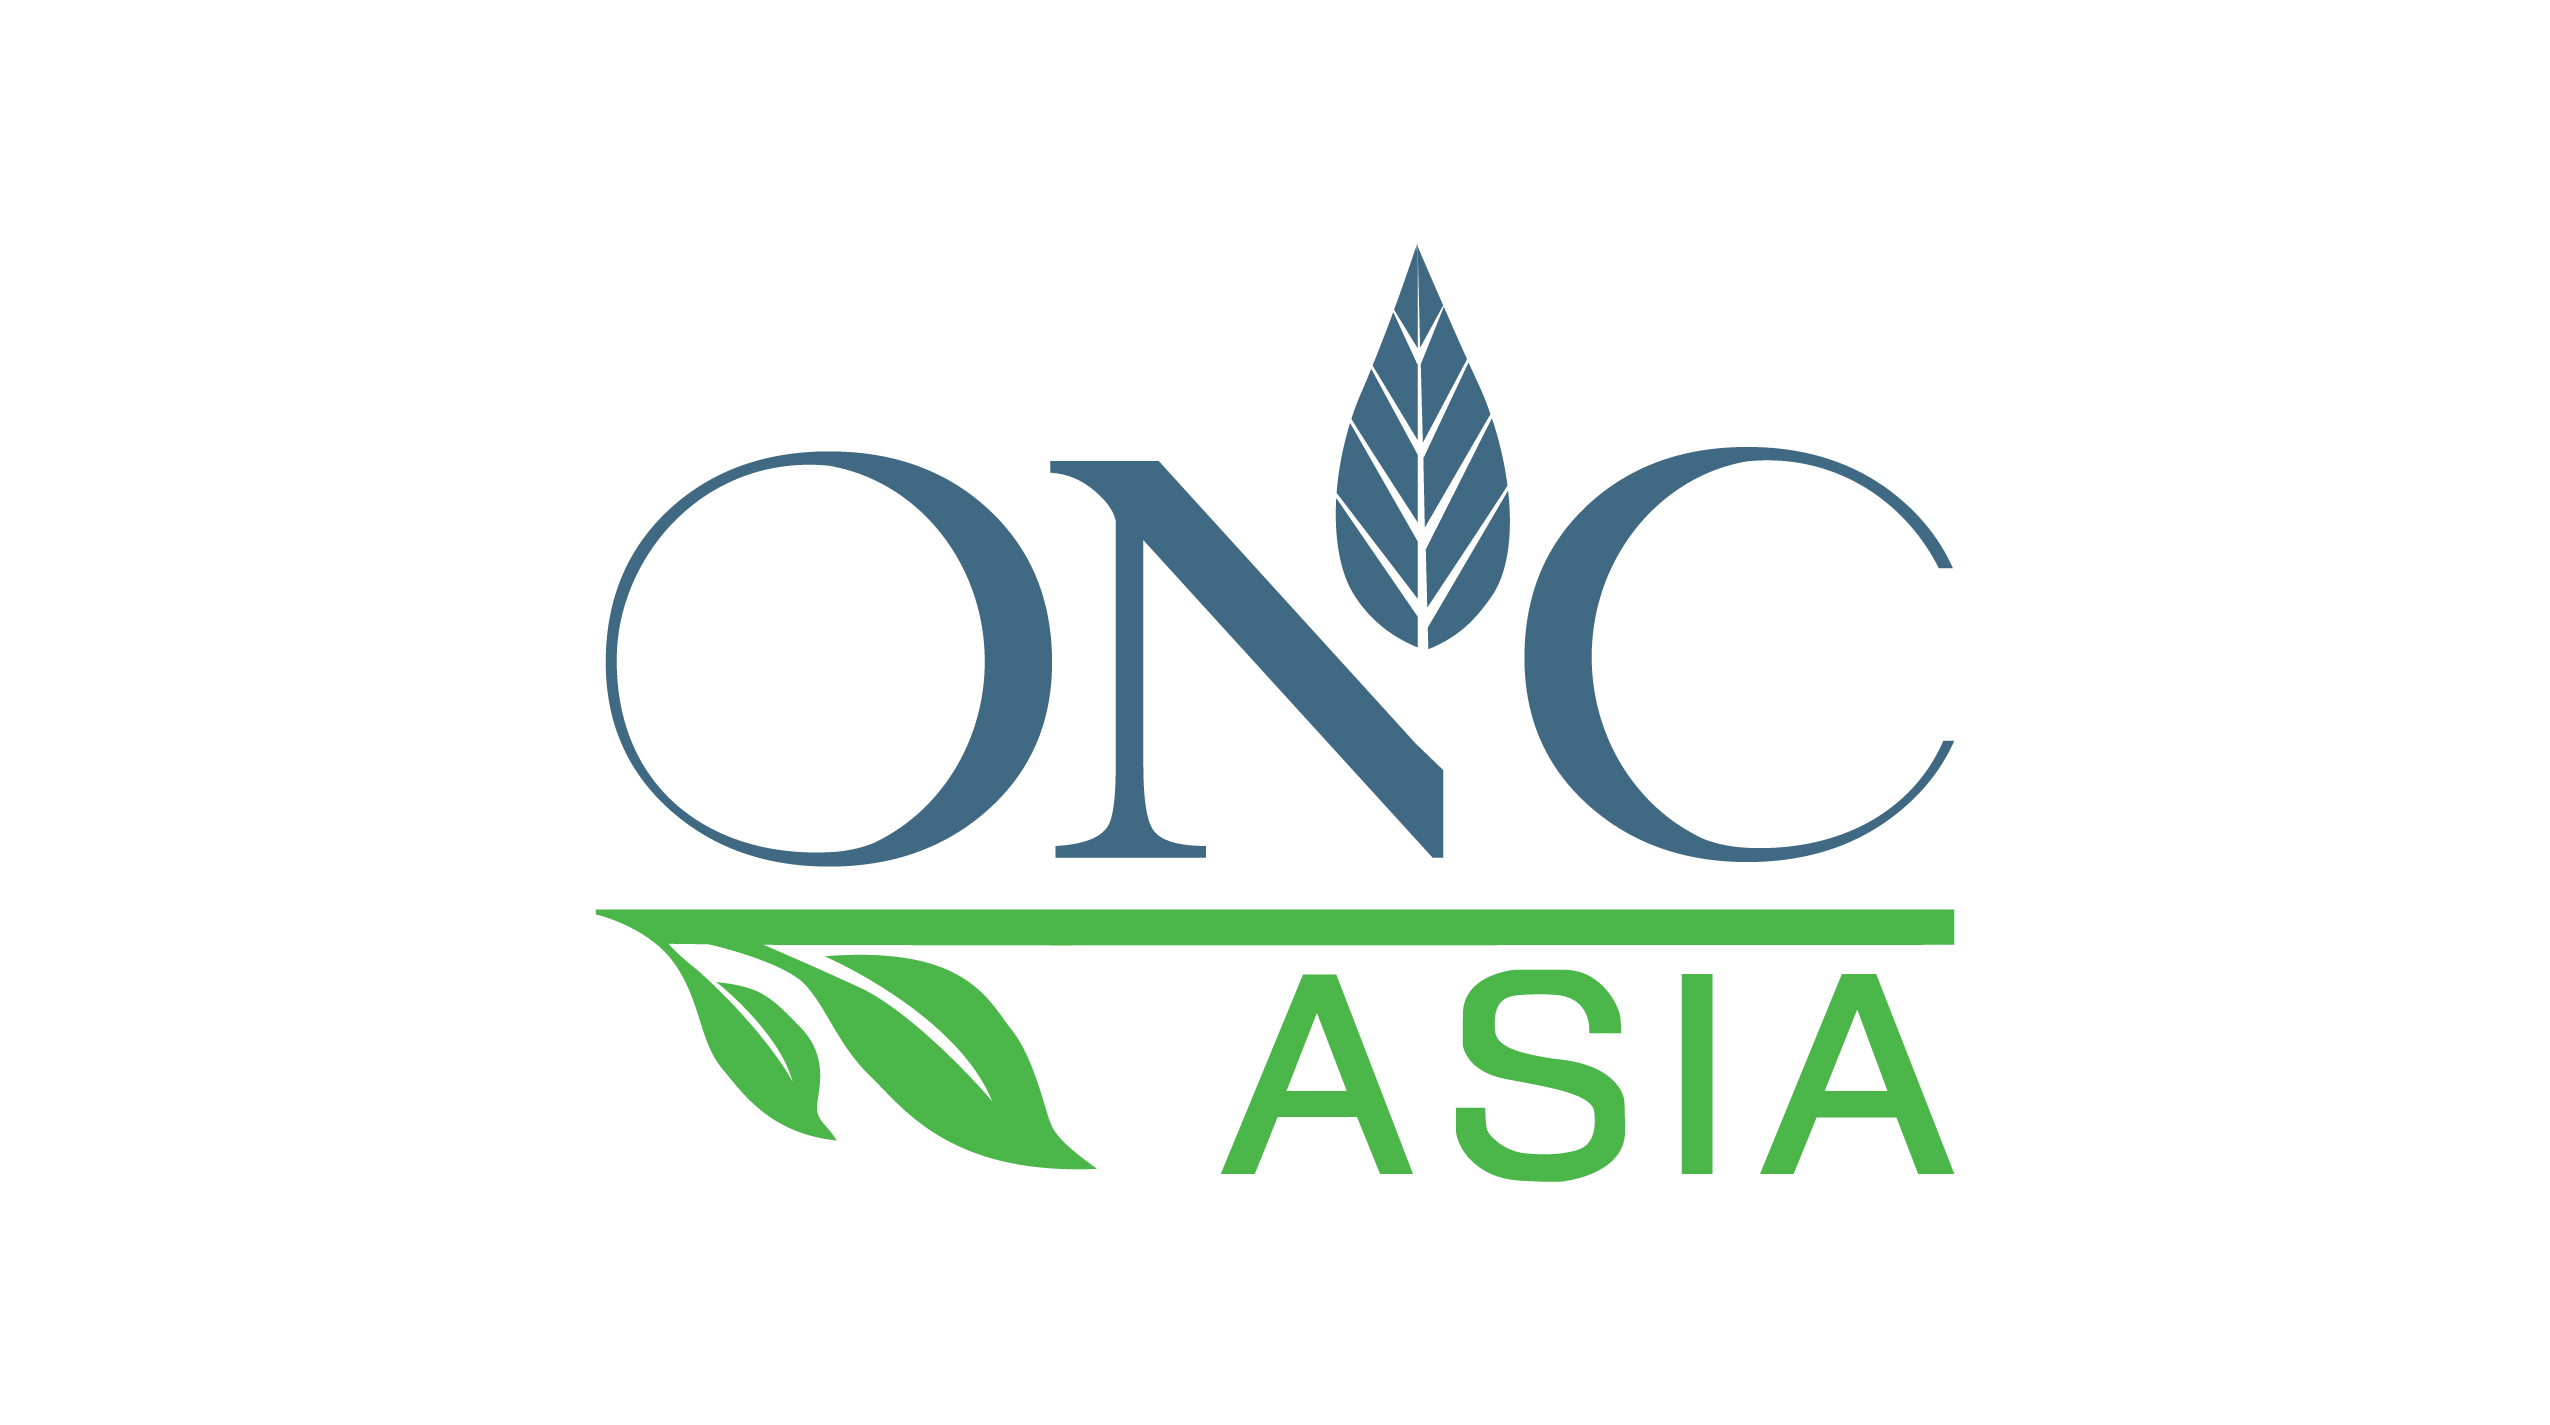 onc-30102018